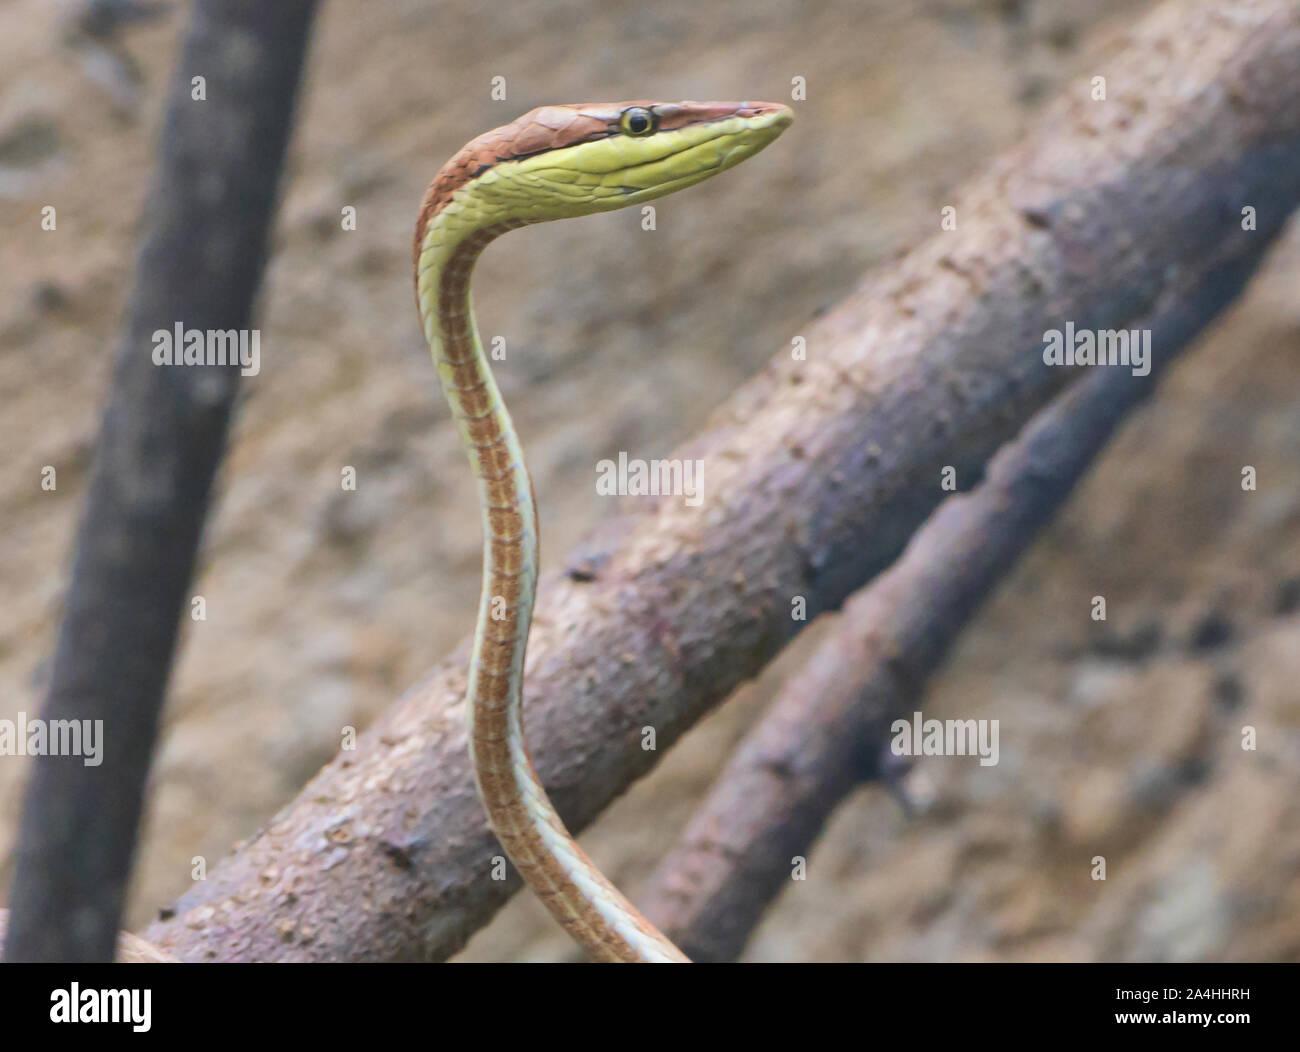 Cope vine snake (oxybelis brevirostris), Ecuador Foto Stock